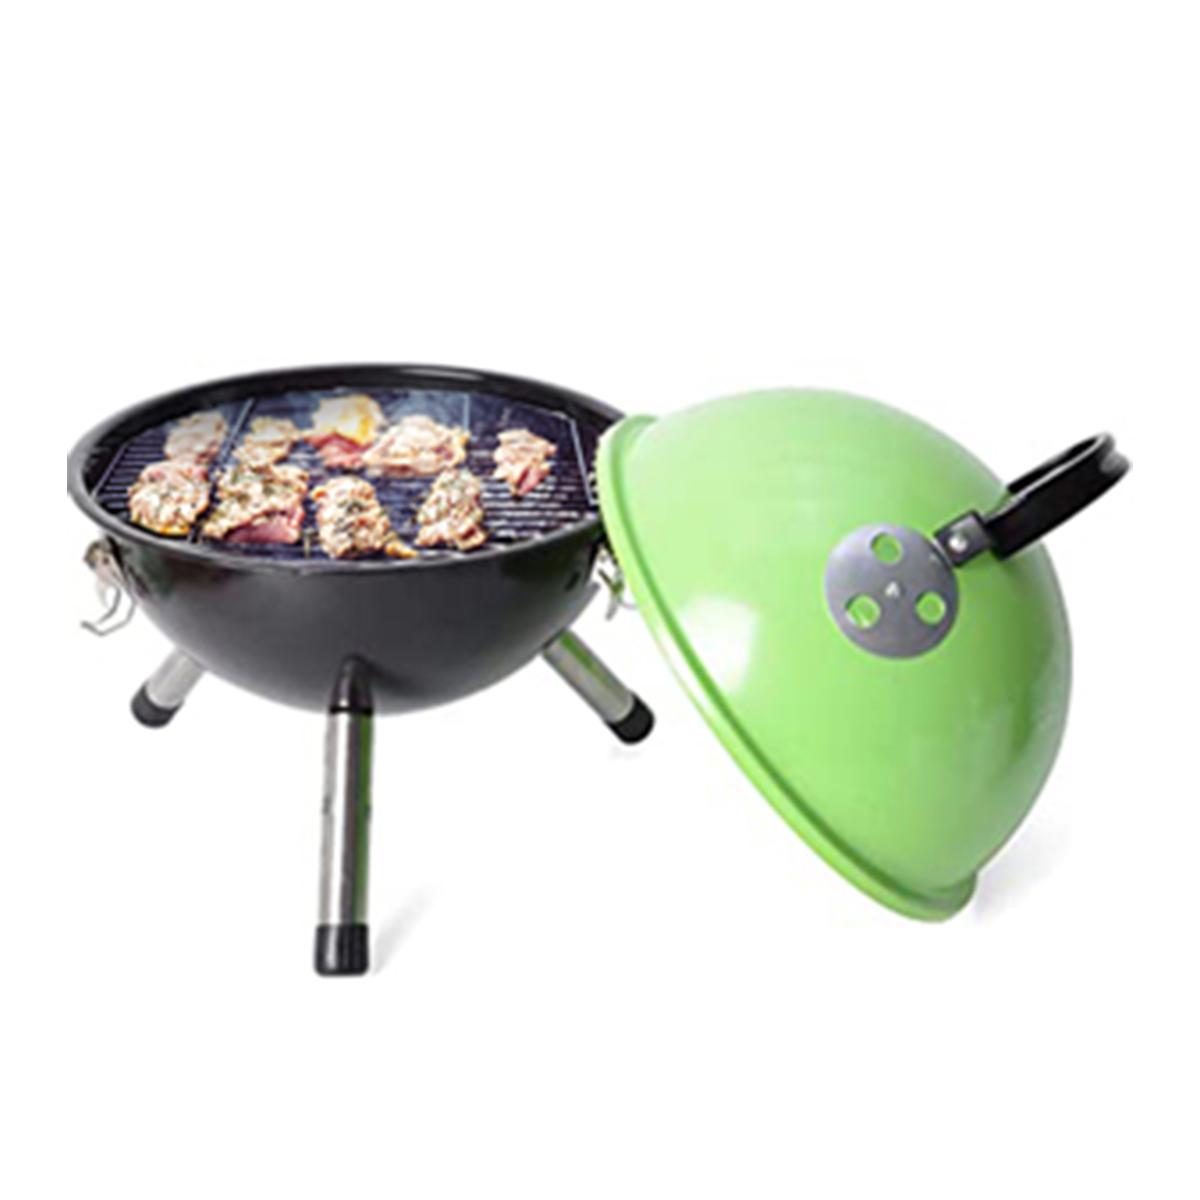 thumbnail 33 - Outdoor Backyard Cooking Mini Portable Charcoal BBQ Grill Bottom Storage